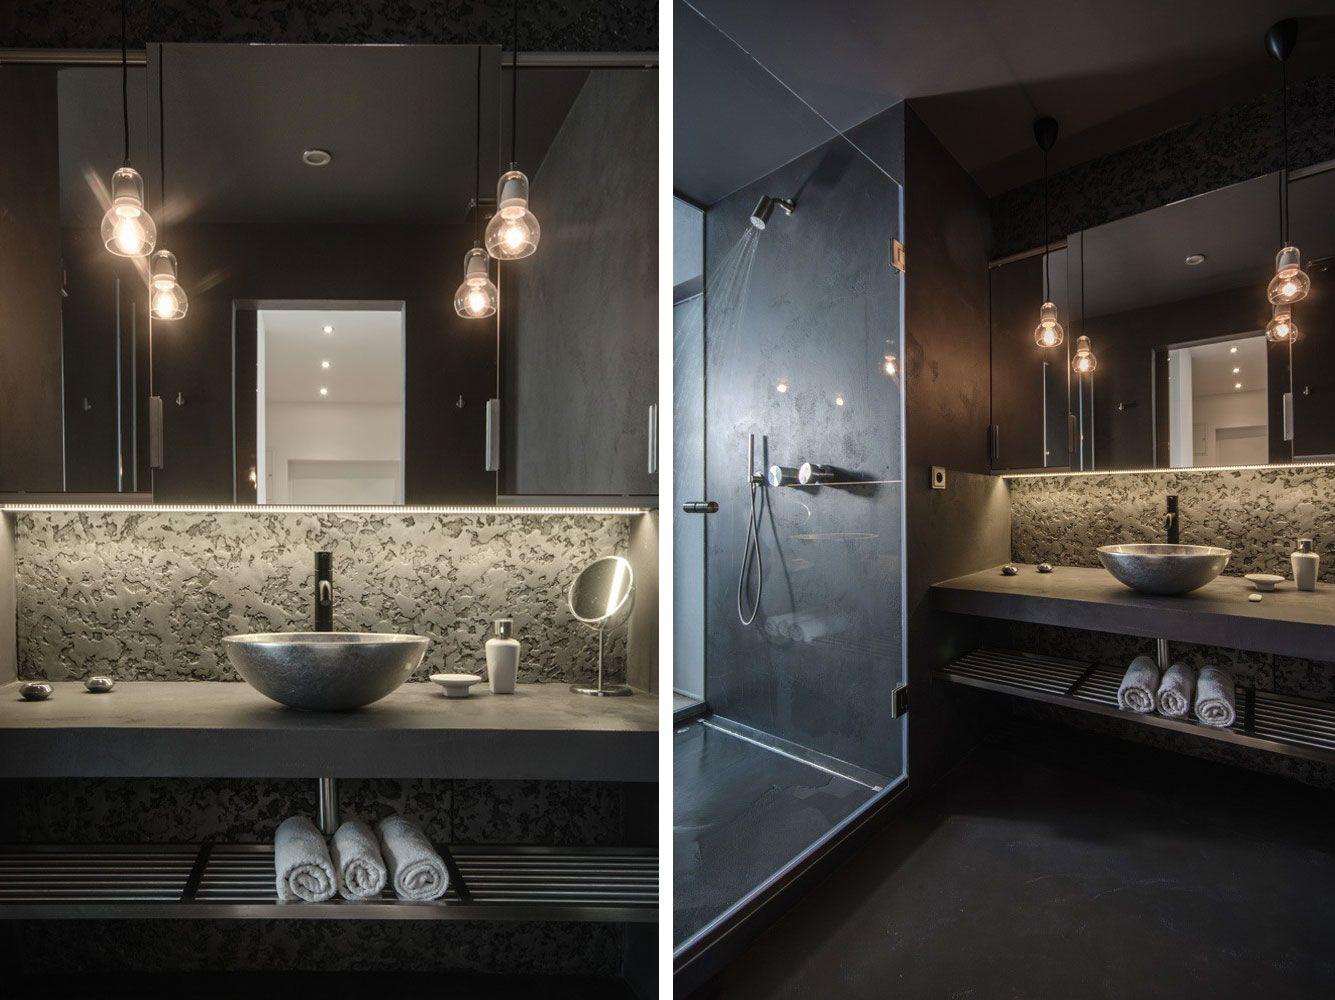 grey-loft-11 | Bathrooms | Pinterest | Lofts and Gray